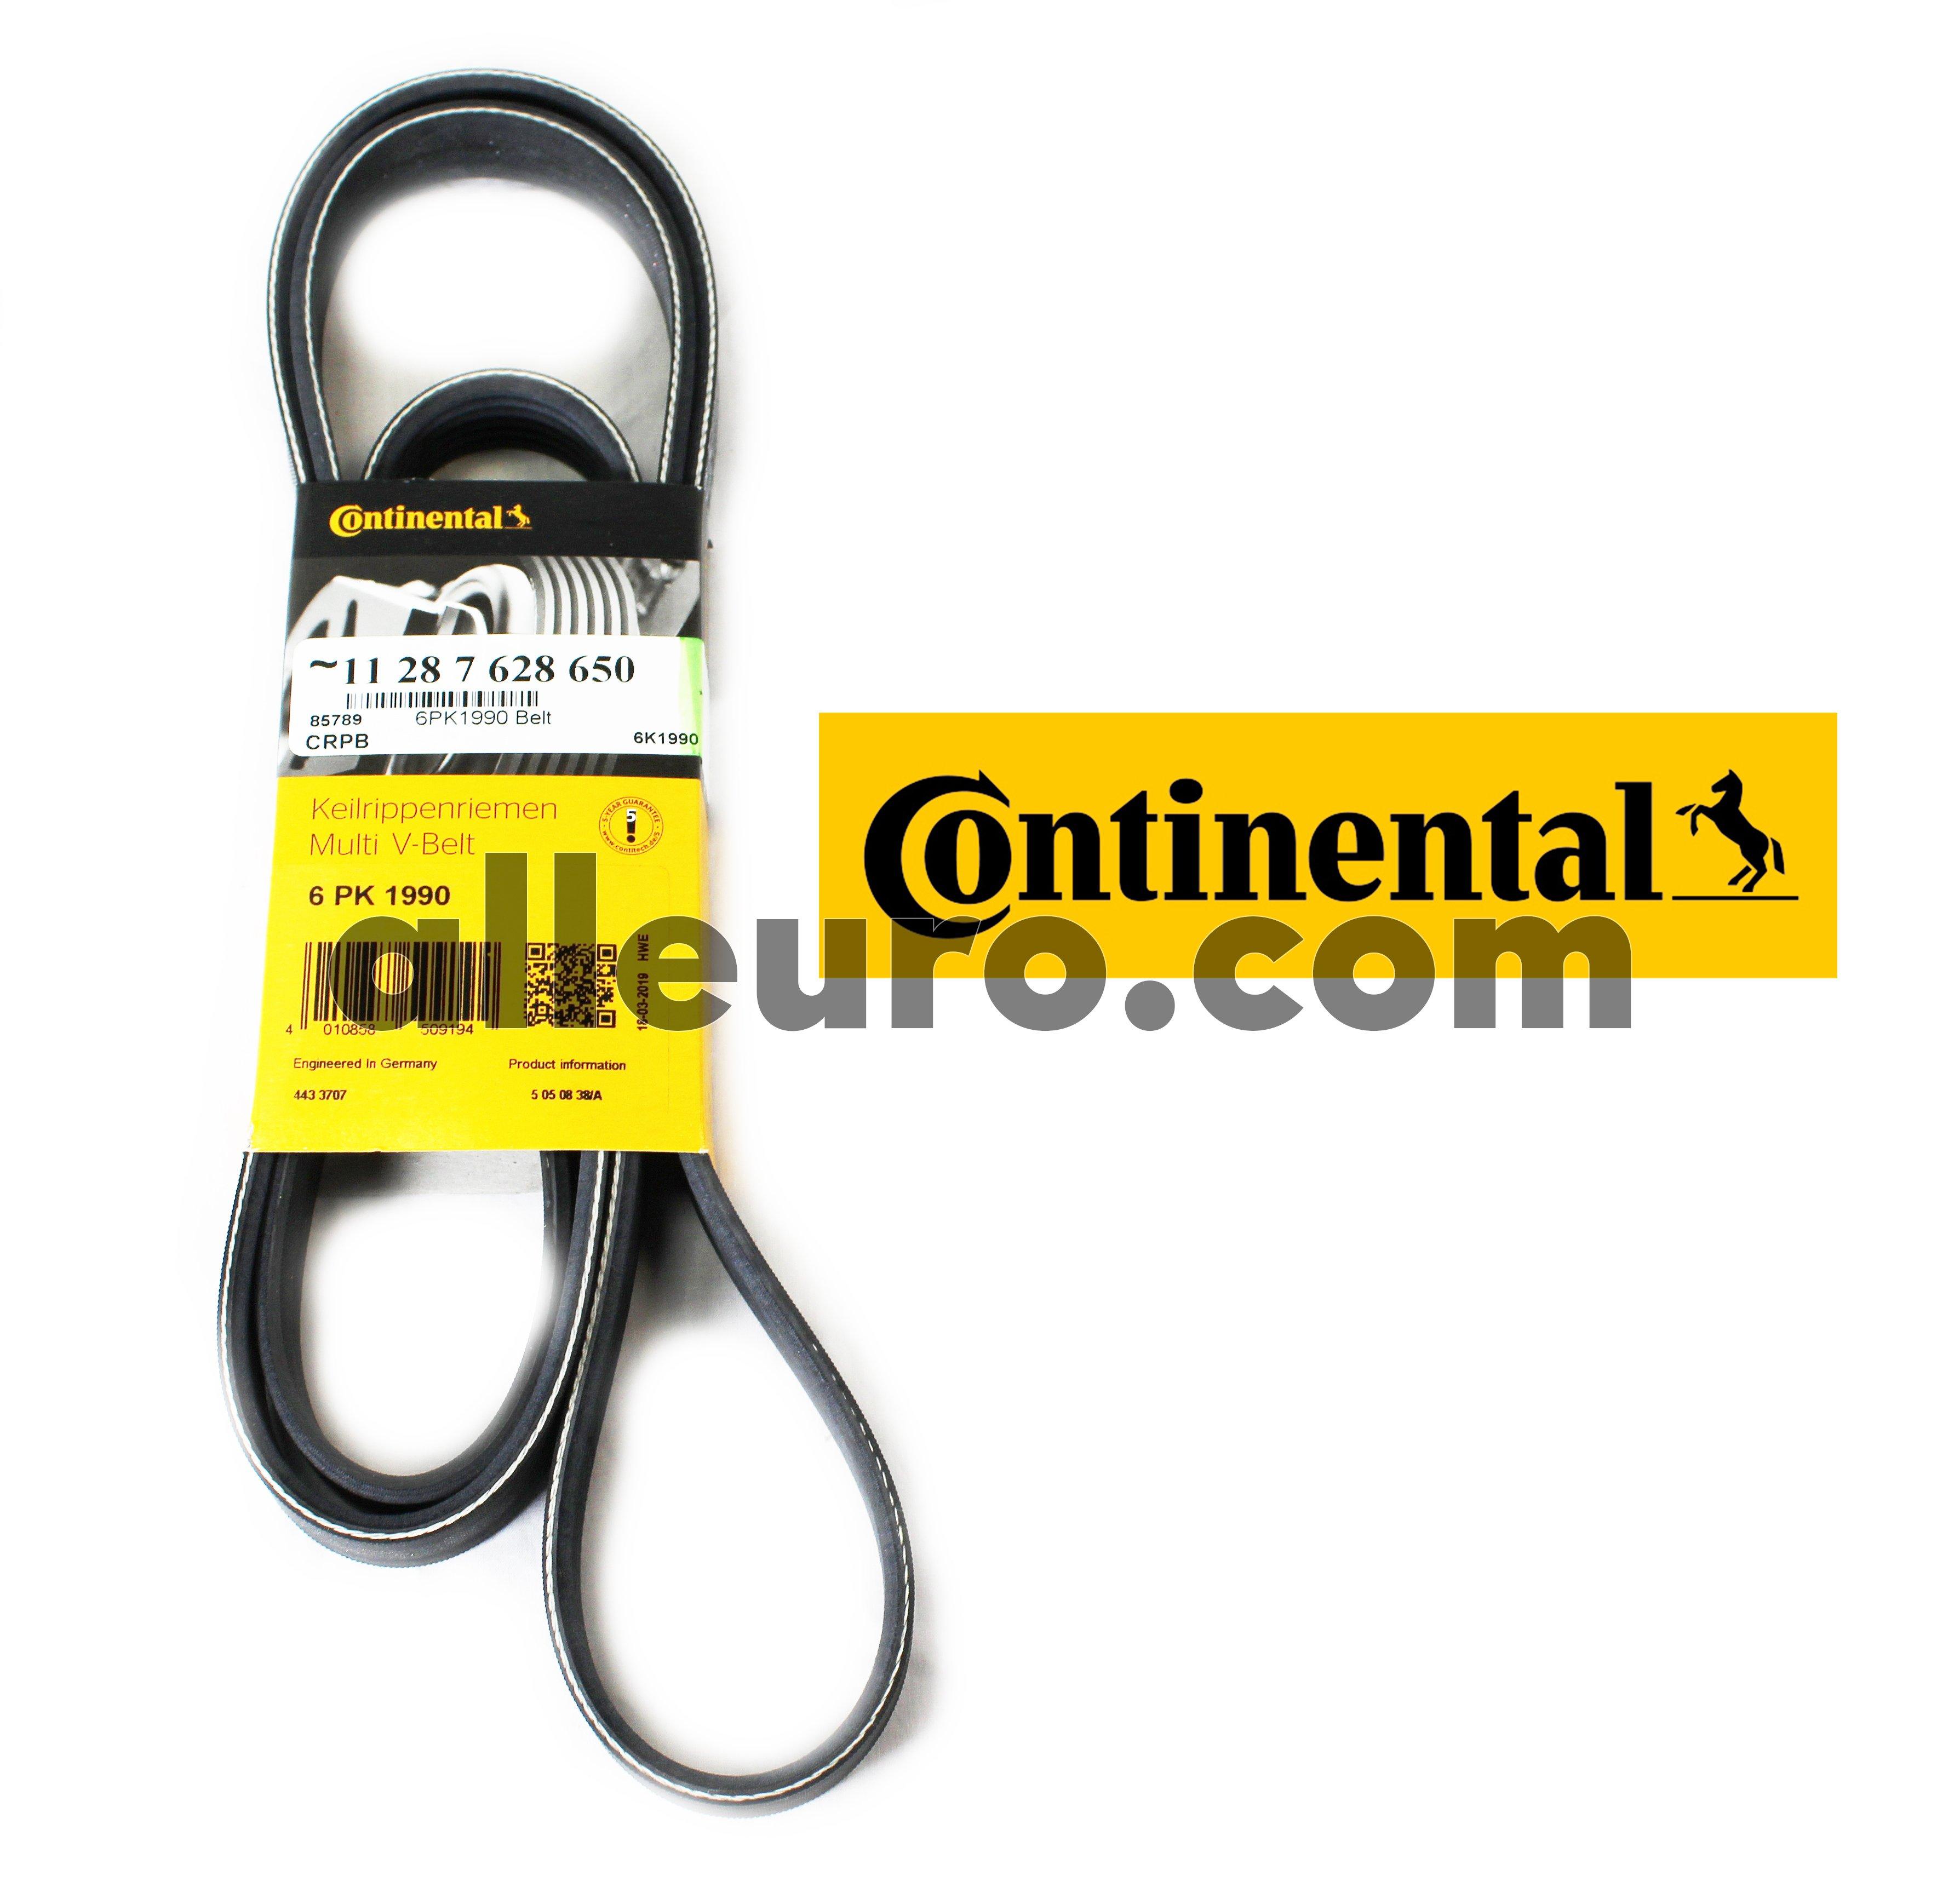 Continental ContiTech Alternator, Power Steering and Air Conditioning Serpentine Belt 11287628650 6K1990